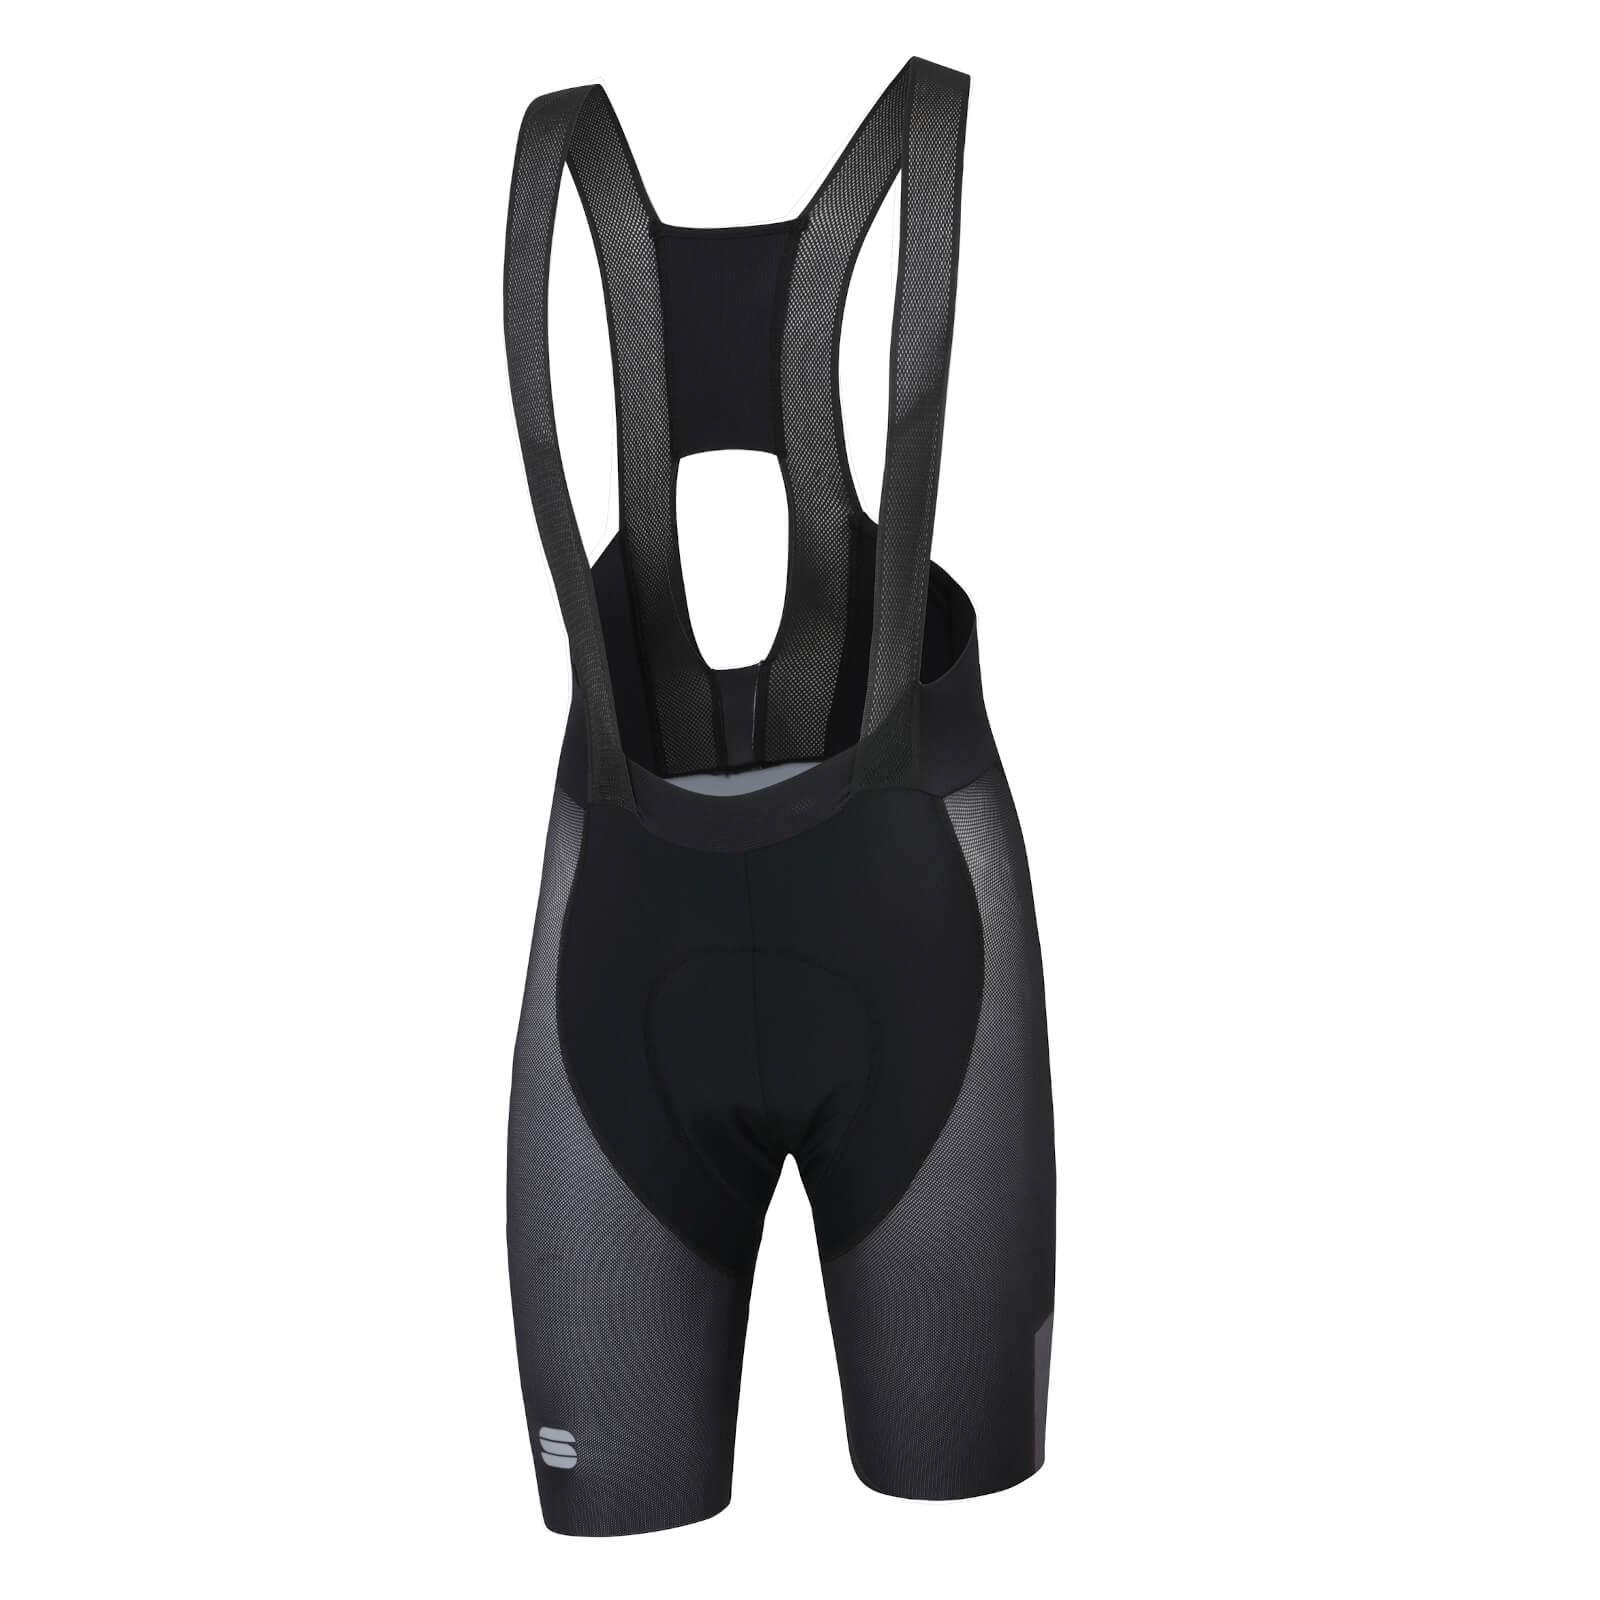 Sportful BodyFit Pro Air Bib Shorts - XL - Black/Anthracite